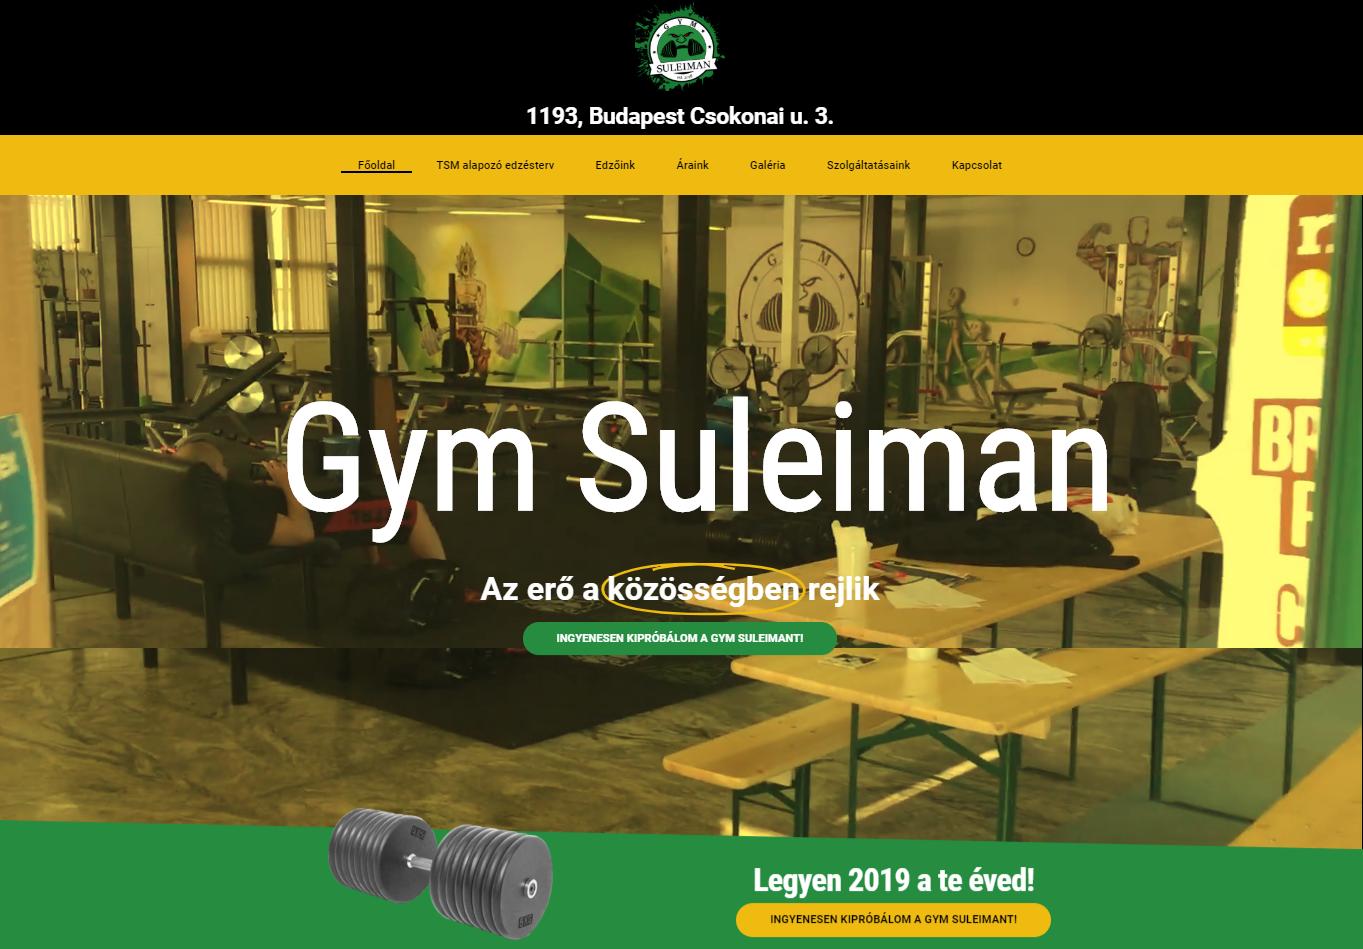 screencapture-gymsuleiman-hu-2019-08-01-22_16_21